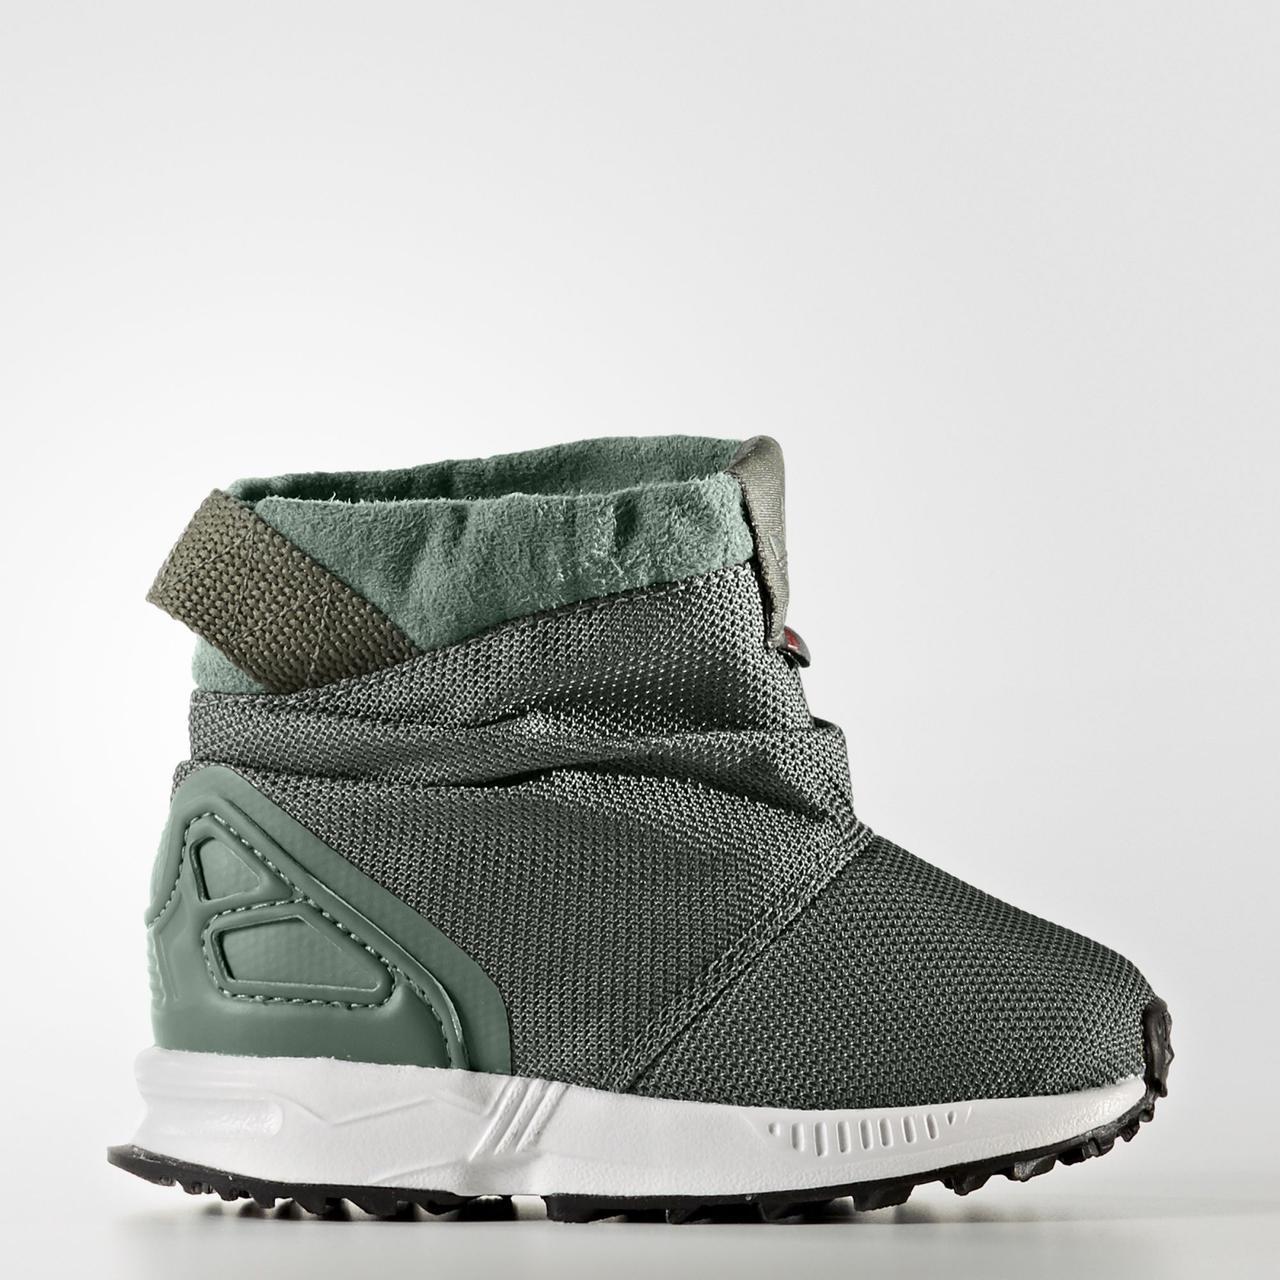 29151f786dcc Детские сапоги Adidas Originals ZX Flux (Артикул  BY9065) -  Интернет-магазин «